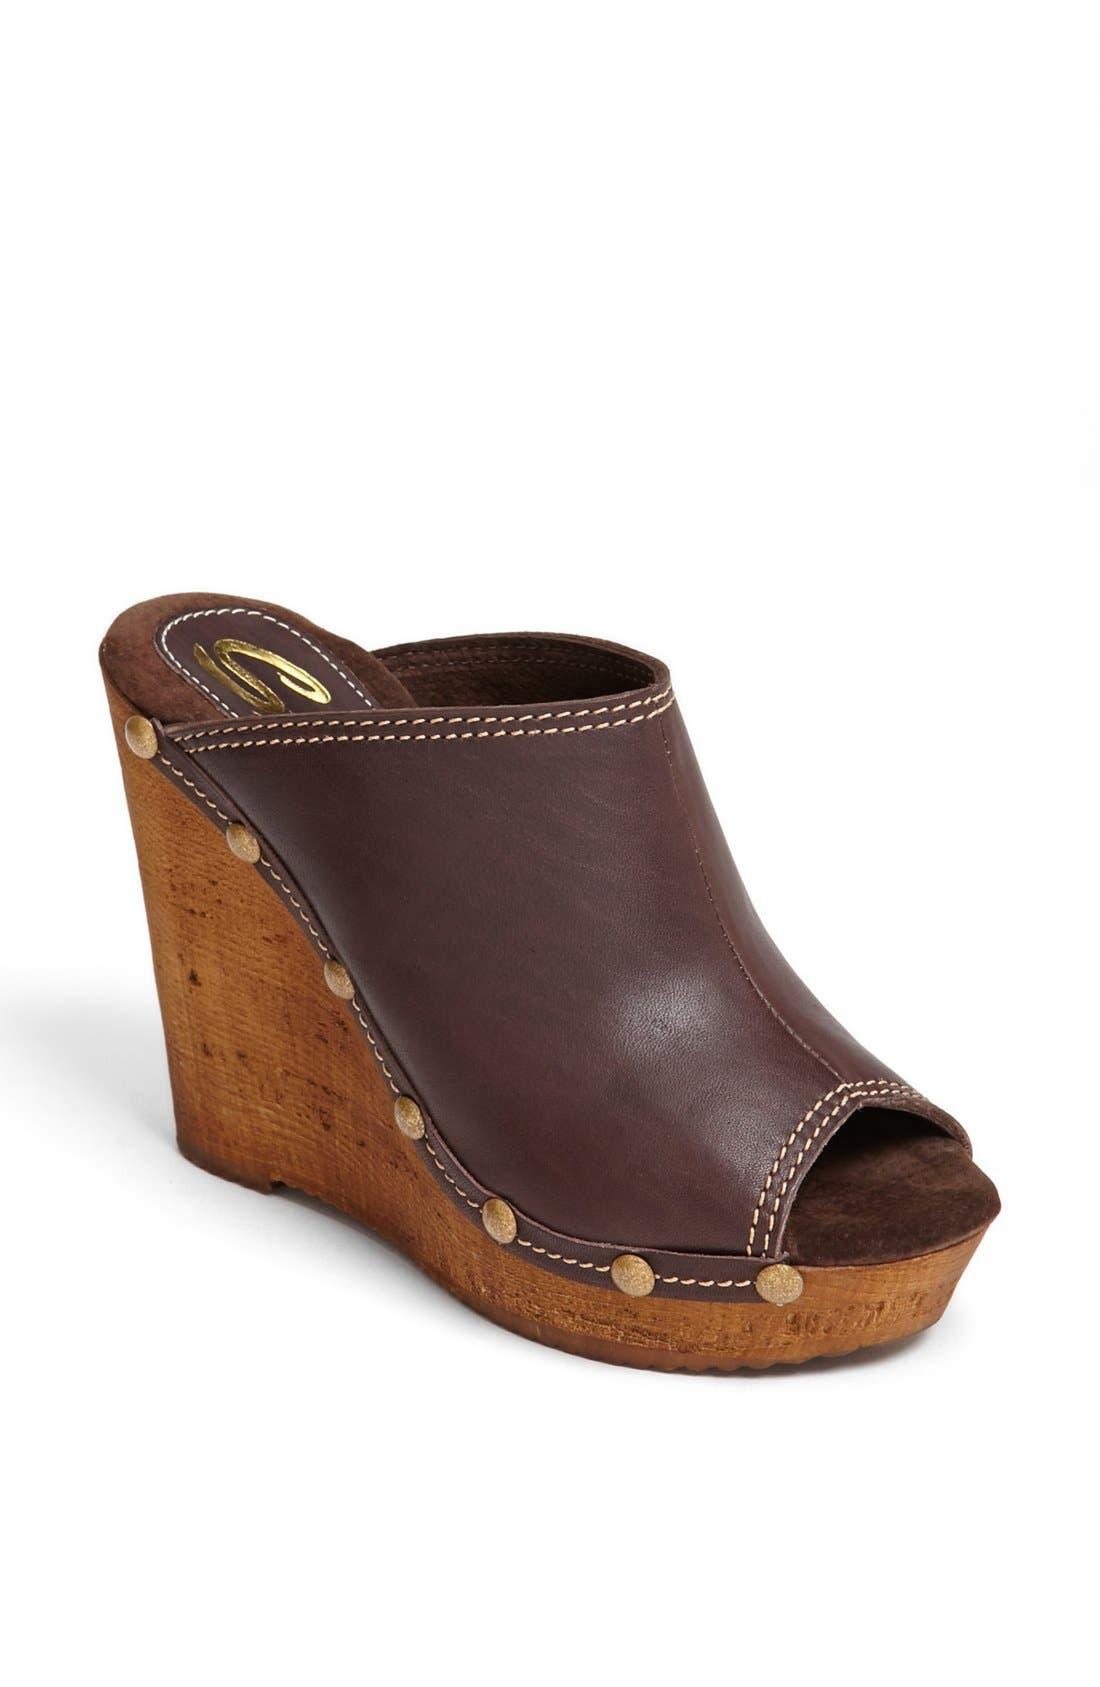 Main Image - Sbicca 'Guthrie' Wedge Sandal